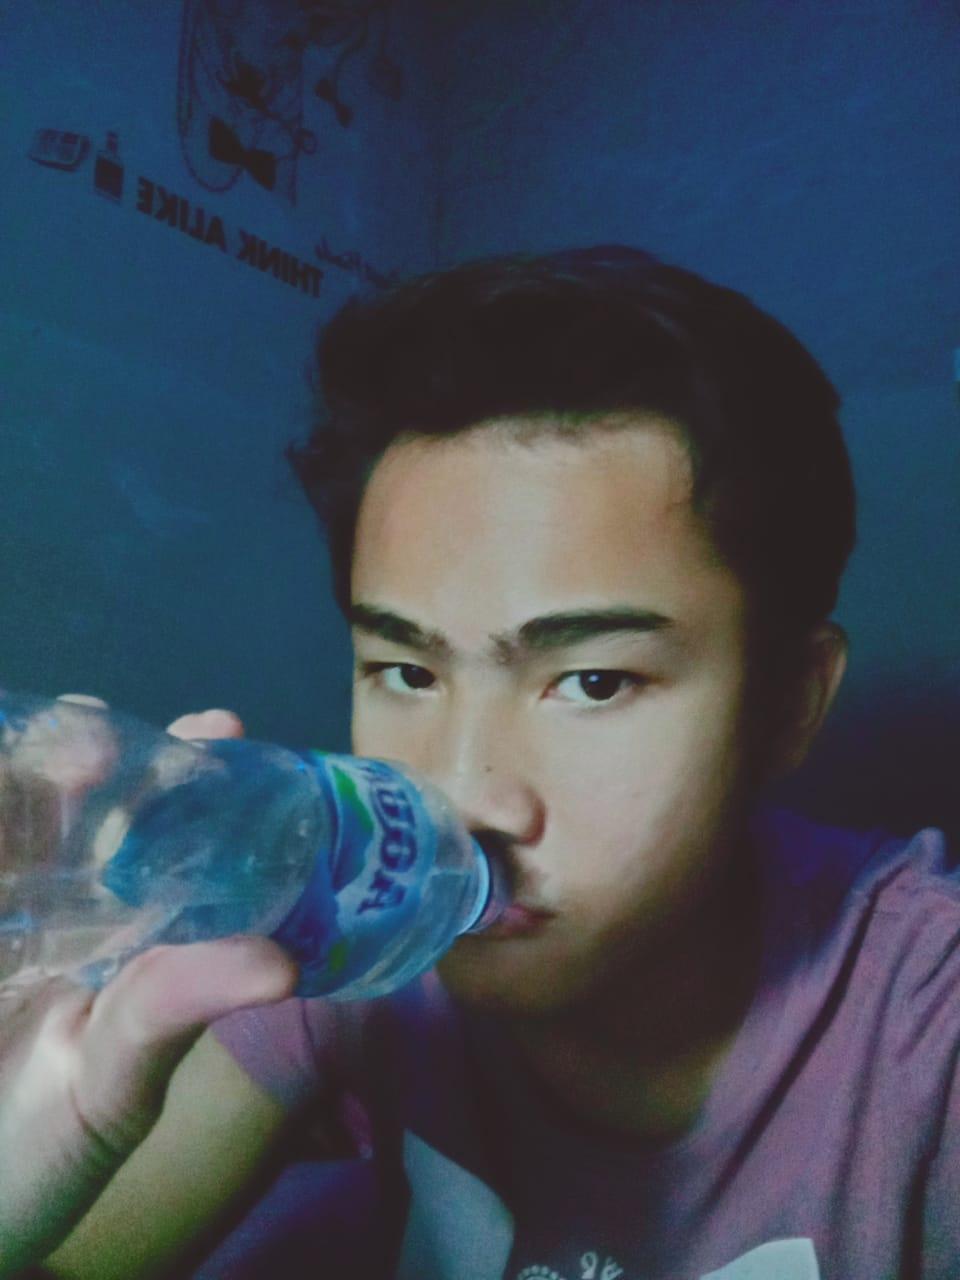 Tuliskan Syarat Fisik Air Bersih Layak Minum : tuliskan, syarat, fisik, bersih, layak, minum, Sebutkan, Komponen, Menjadi, Syarat, Bersih, Brainly.co.id